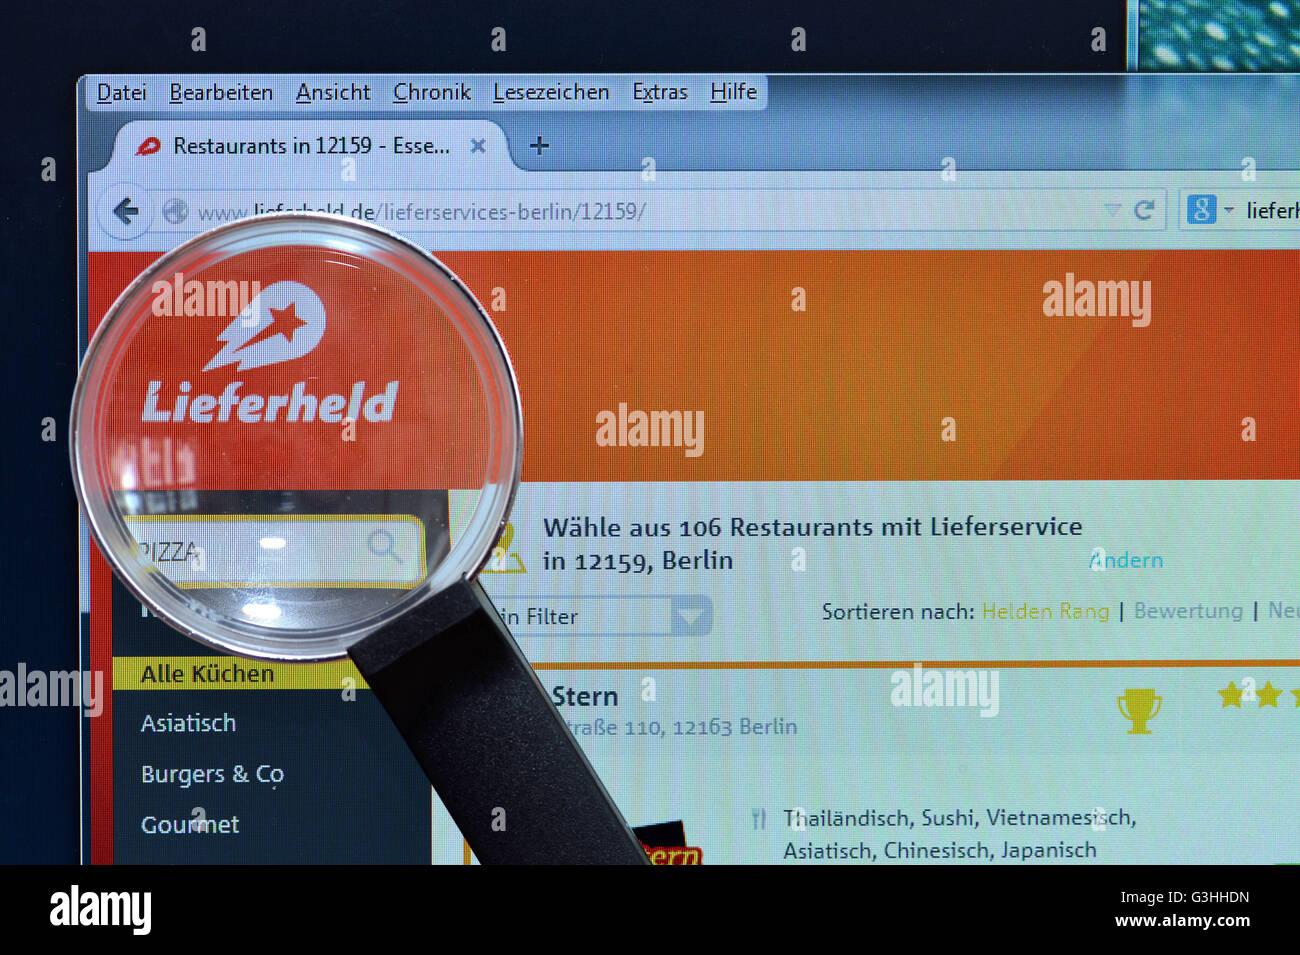 Bildschirm, Internet, Lupe, Lieferservice, lieferheld.de - Stock Image